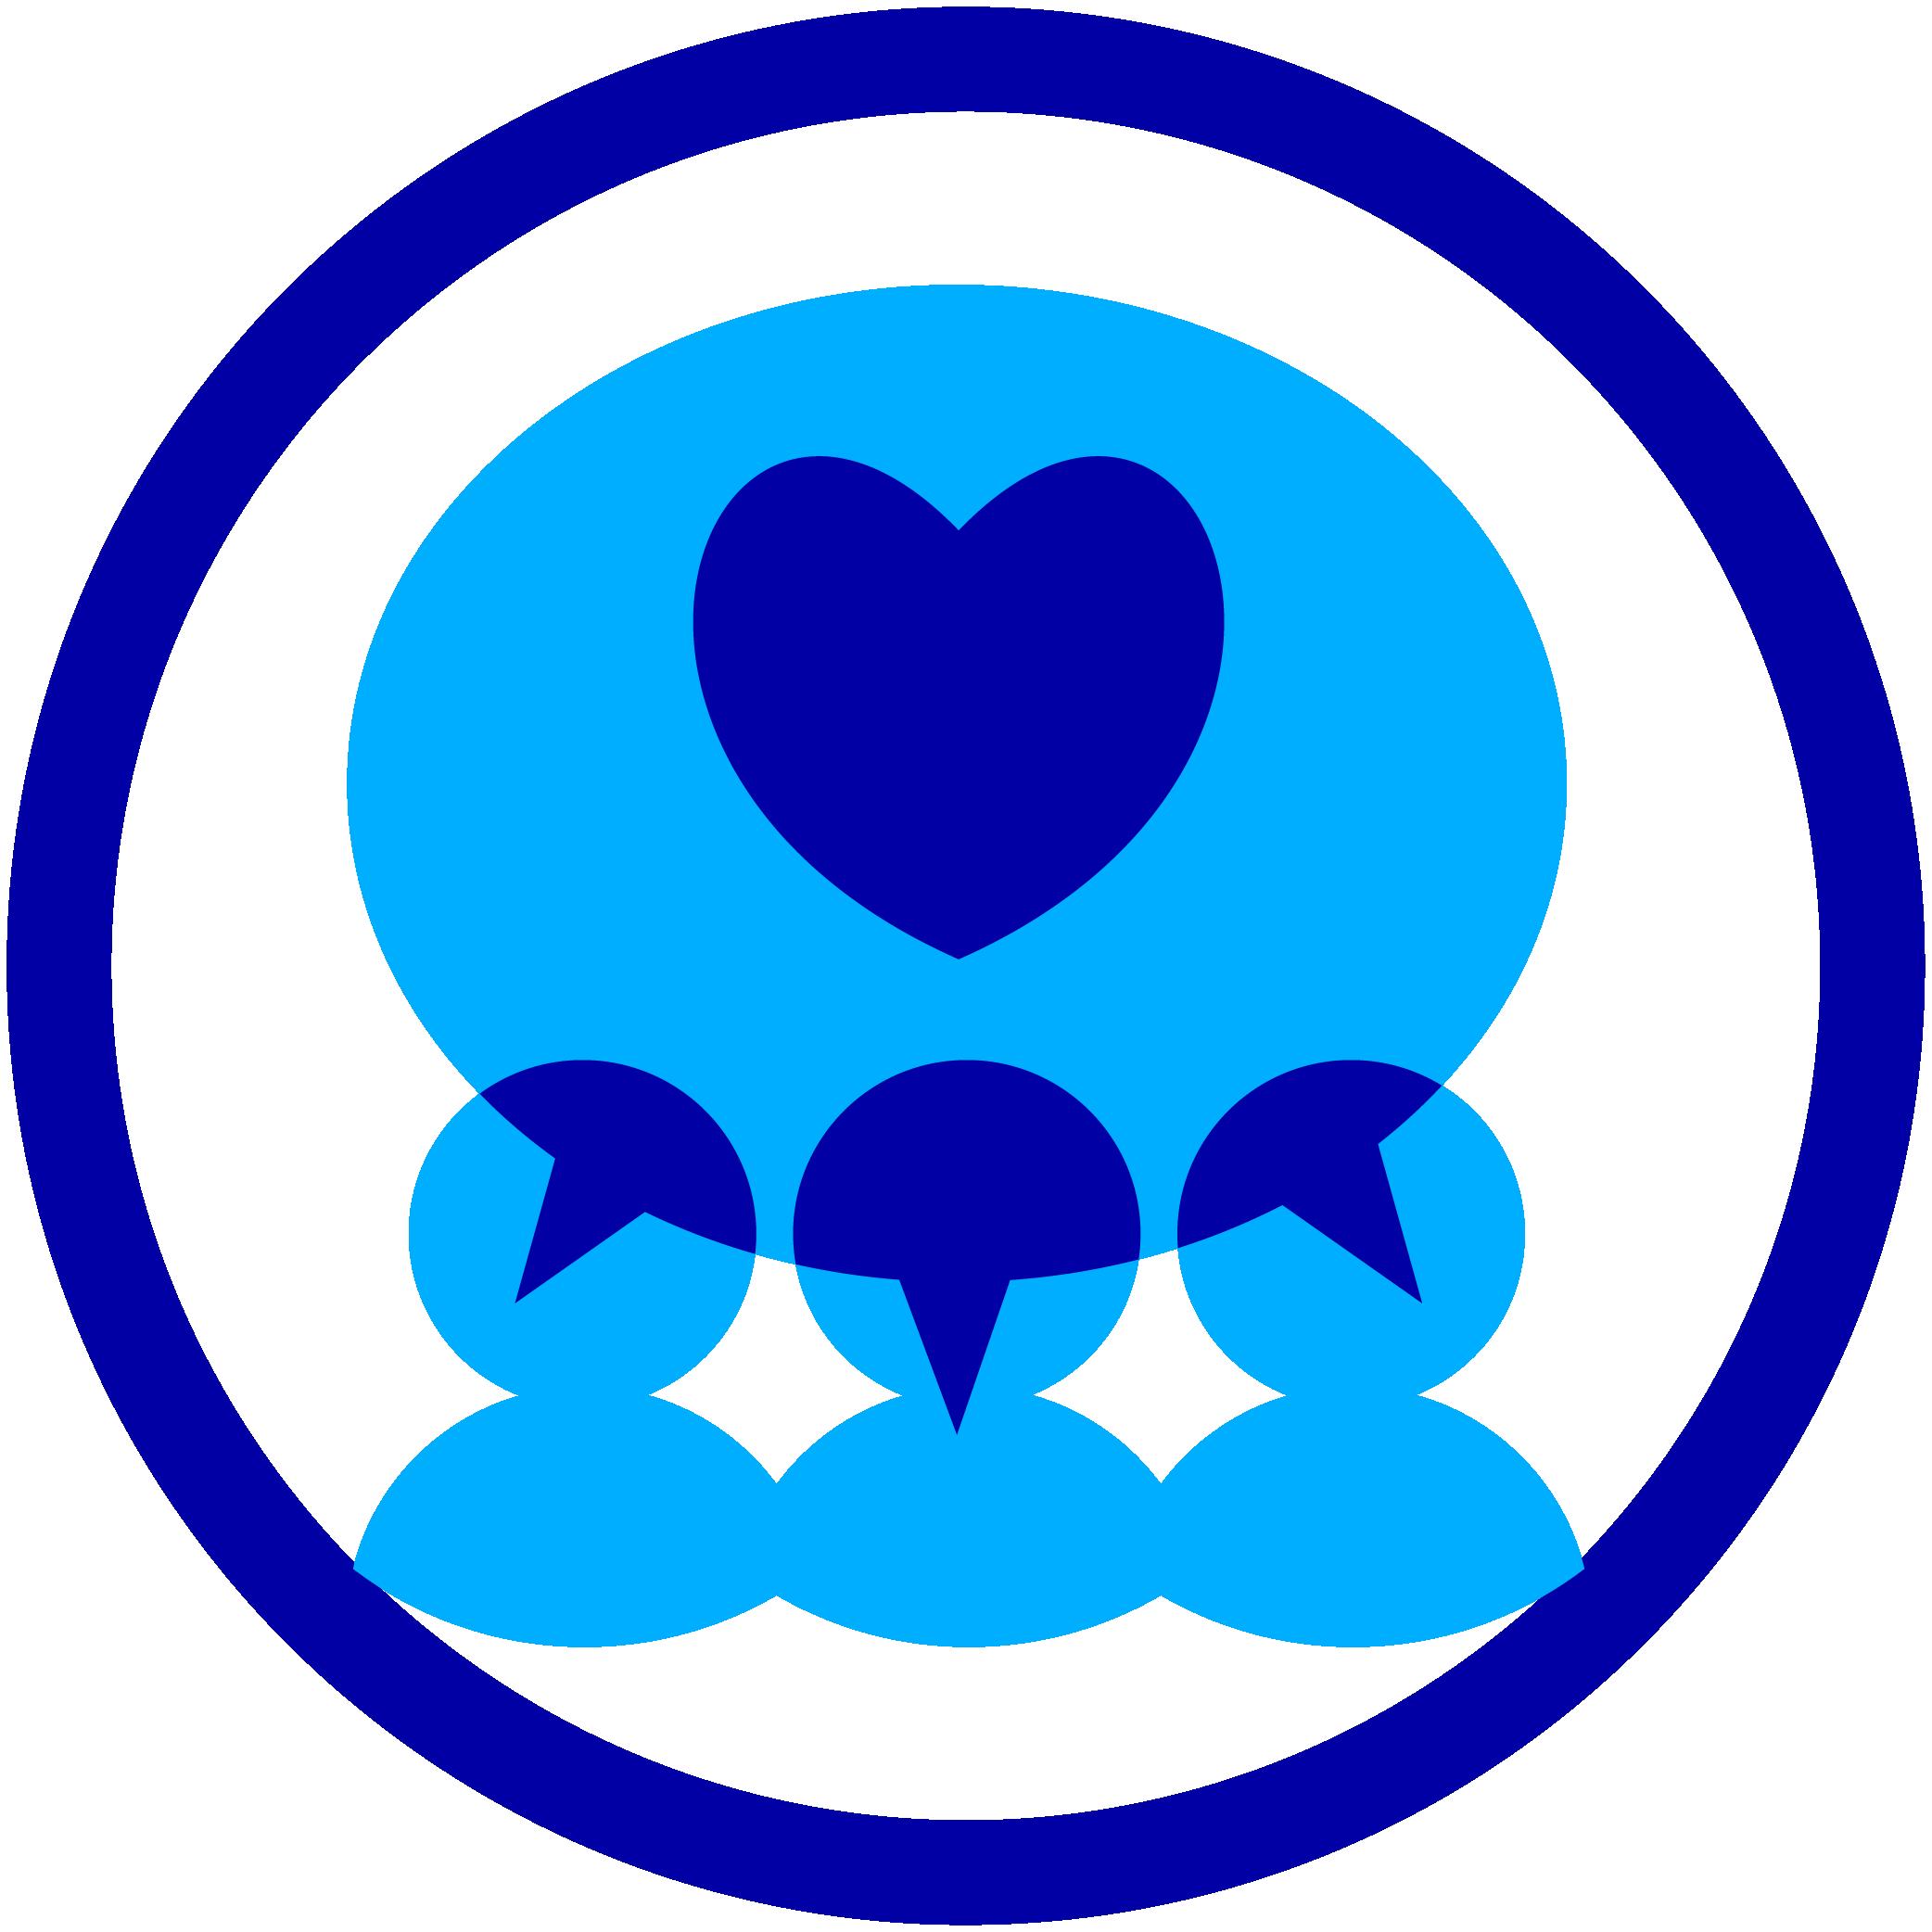 https://co.fi-group.com/wp-content/uploads/sites/14/2021/02/blue-icons-set_1-54.png